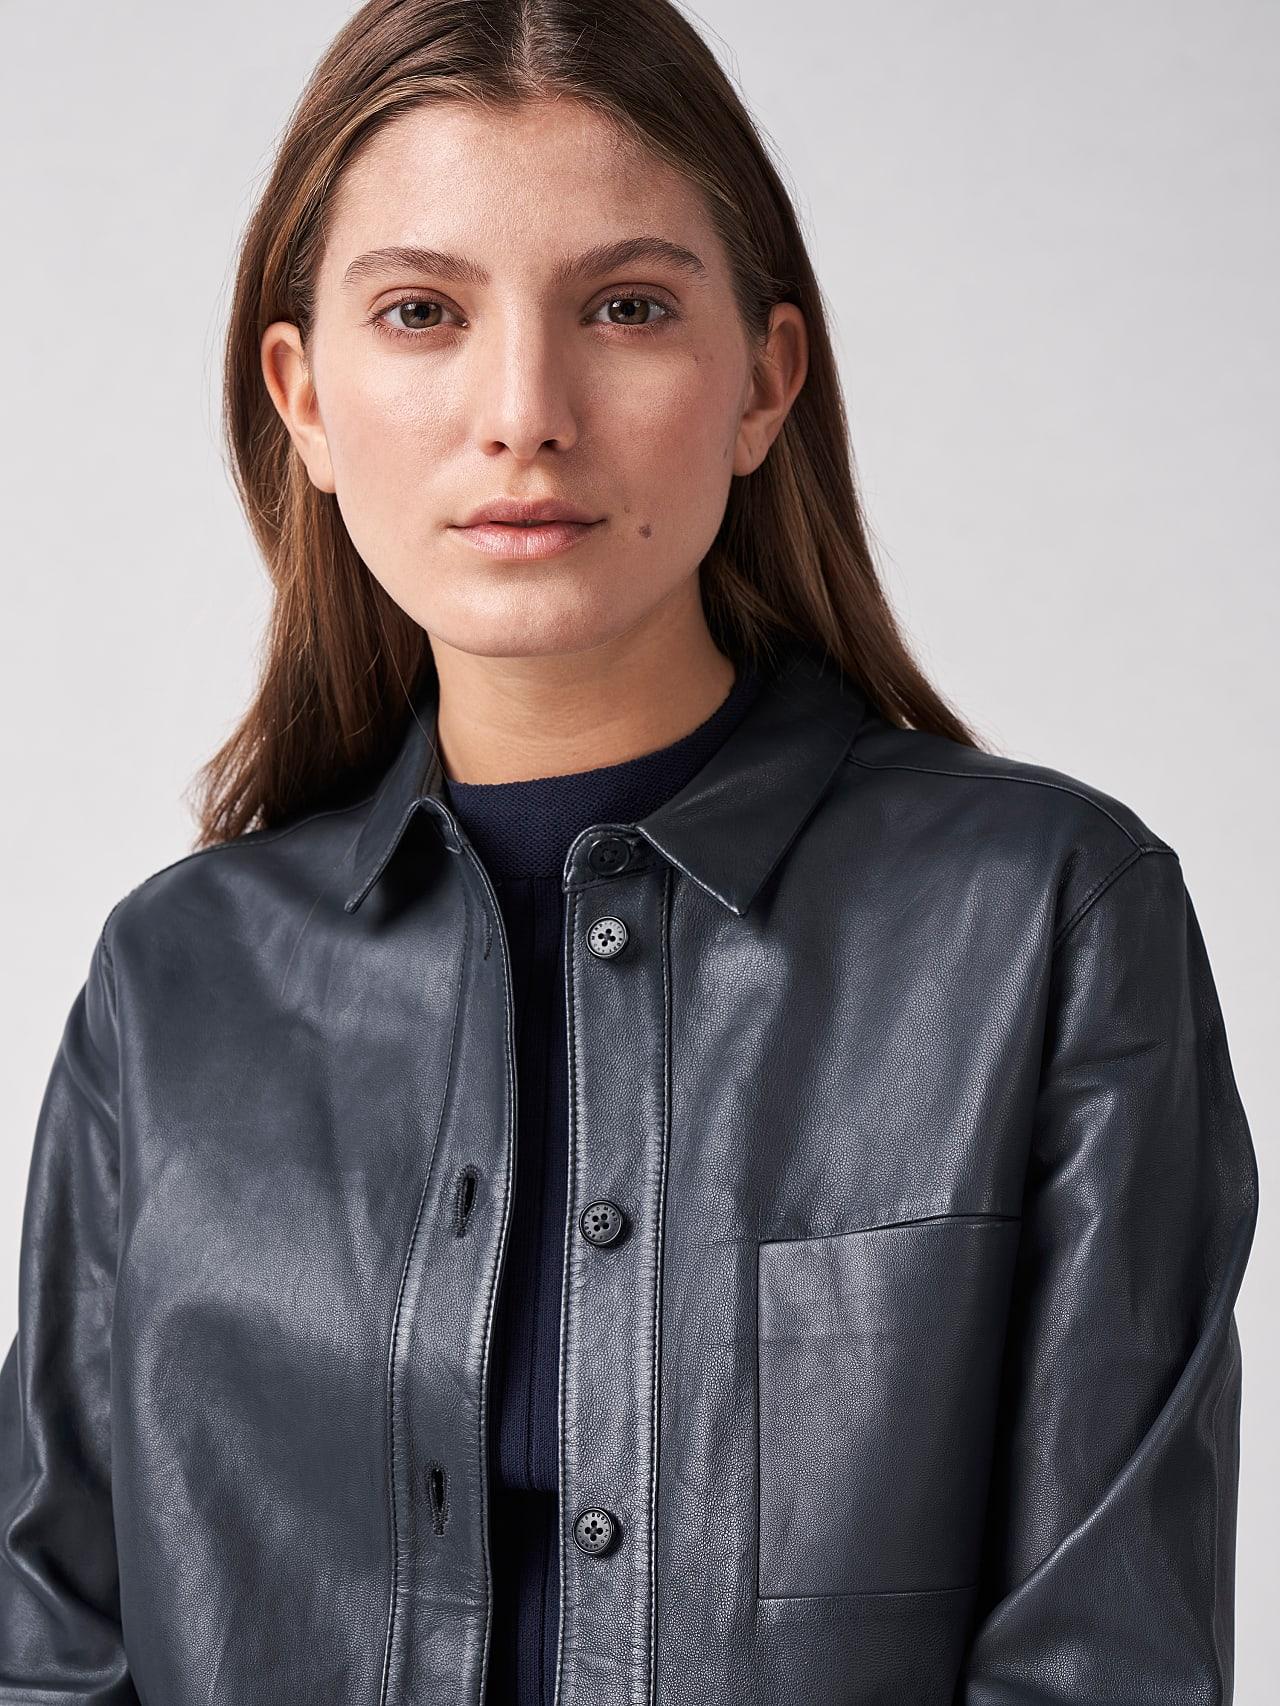 LEORD V1.Y5.01 Leather Shirt navy Right Alpha Tauri